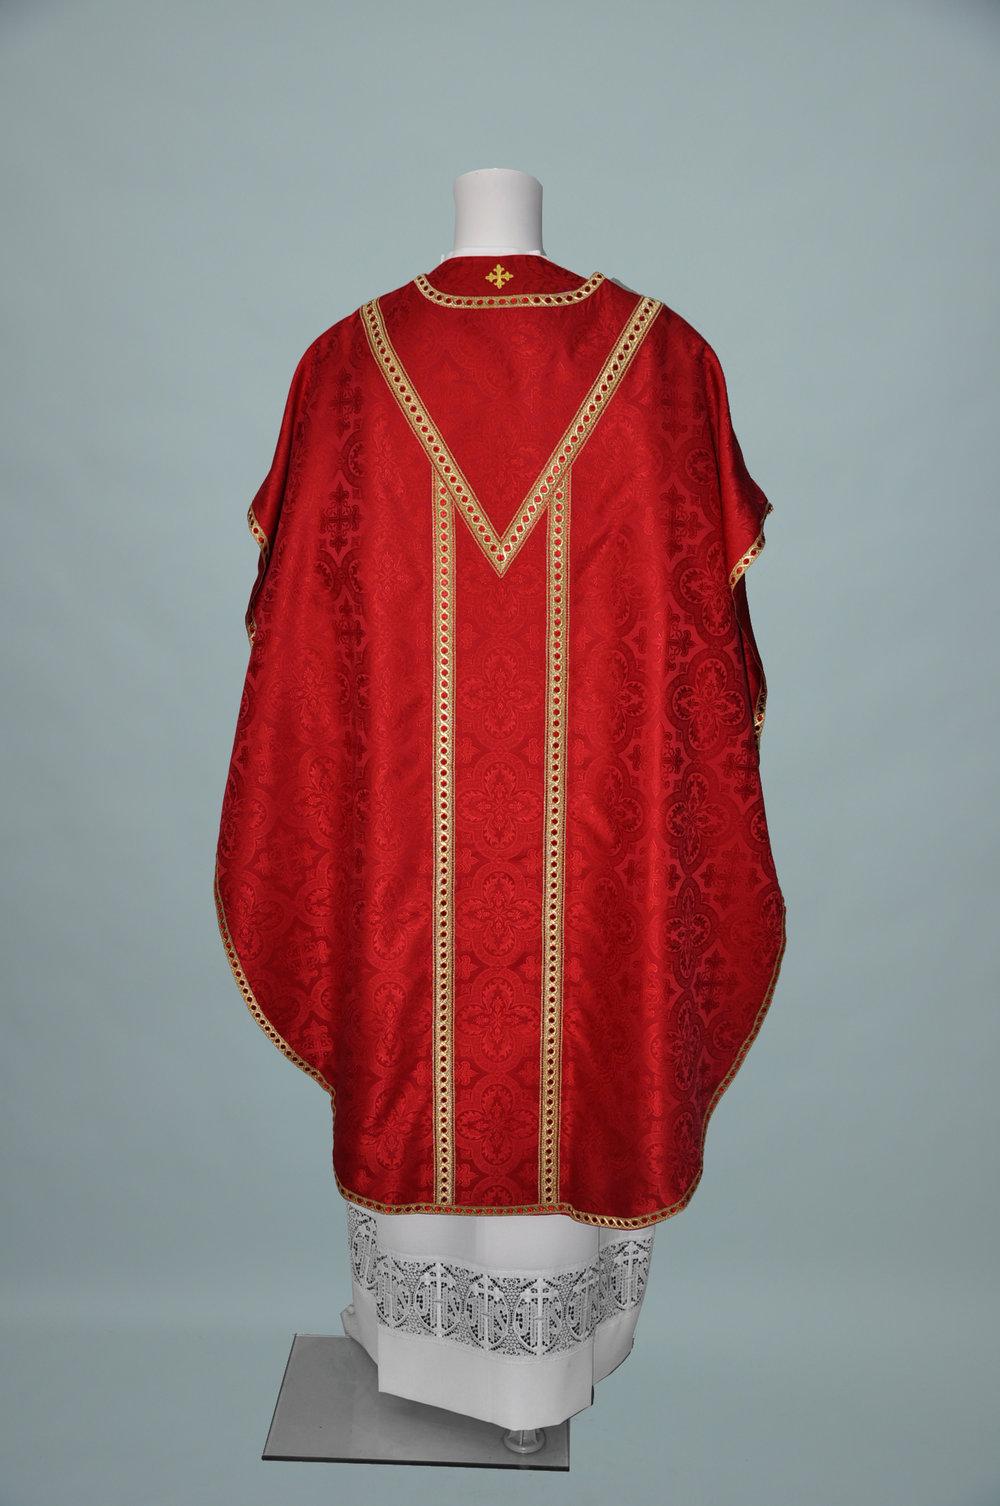 St Philip Neri Davinci Red W 2326 red gold (b)1.jpg